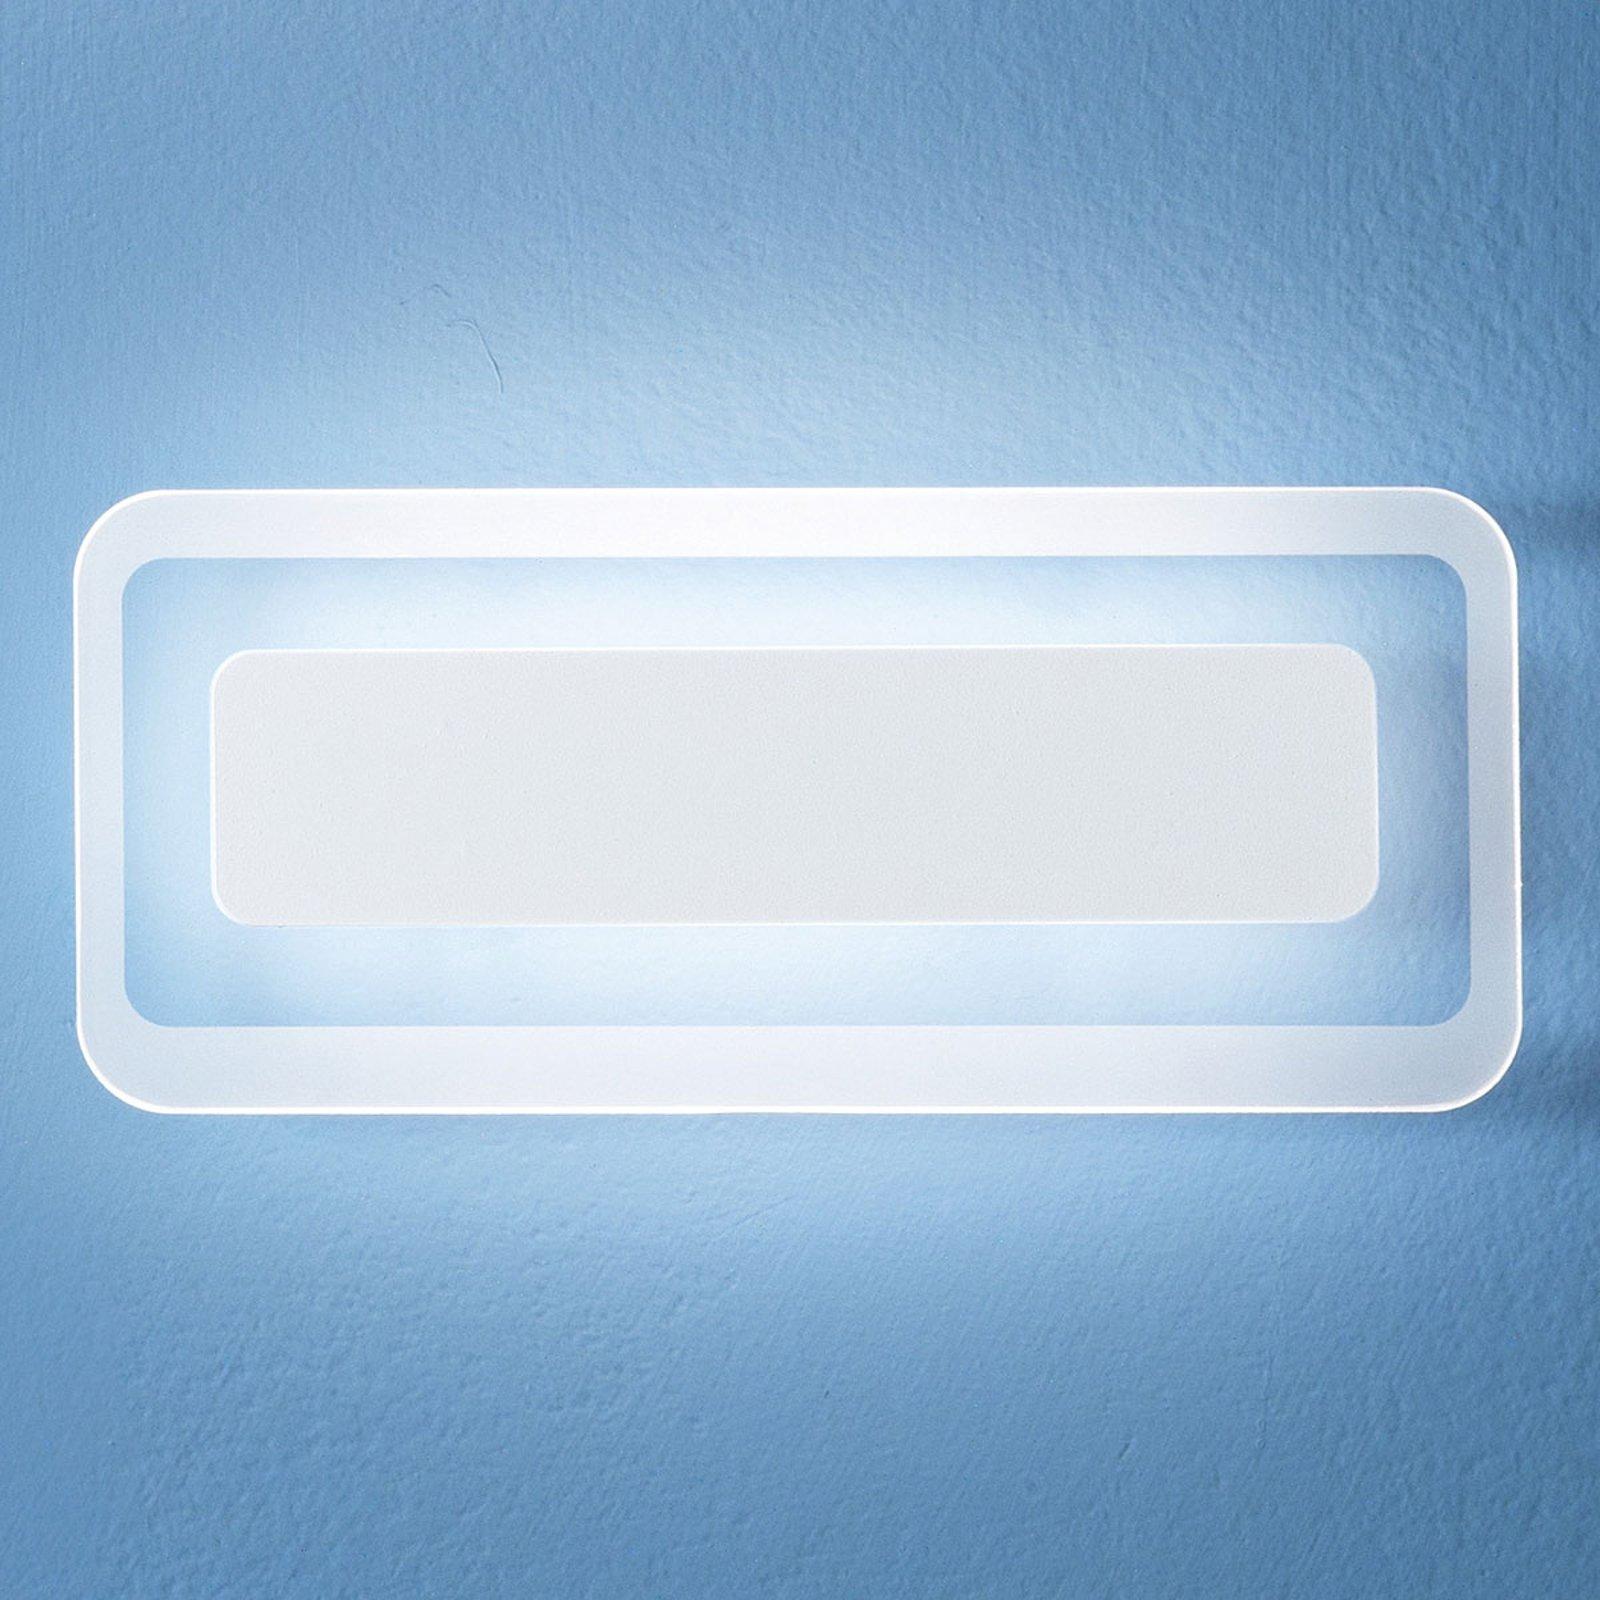 Antille LED-vegglampe hvit 31,4 cm